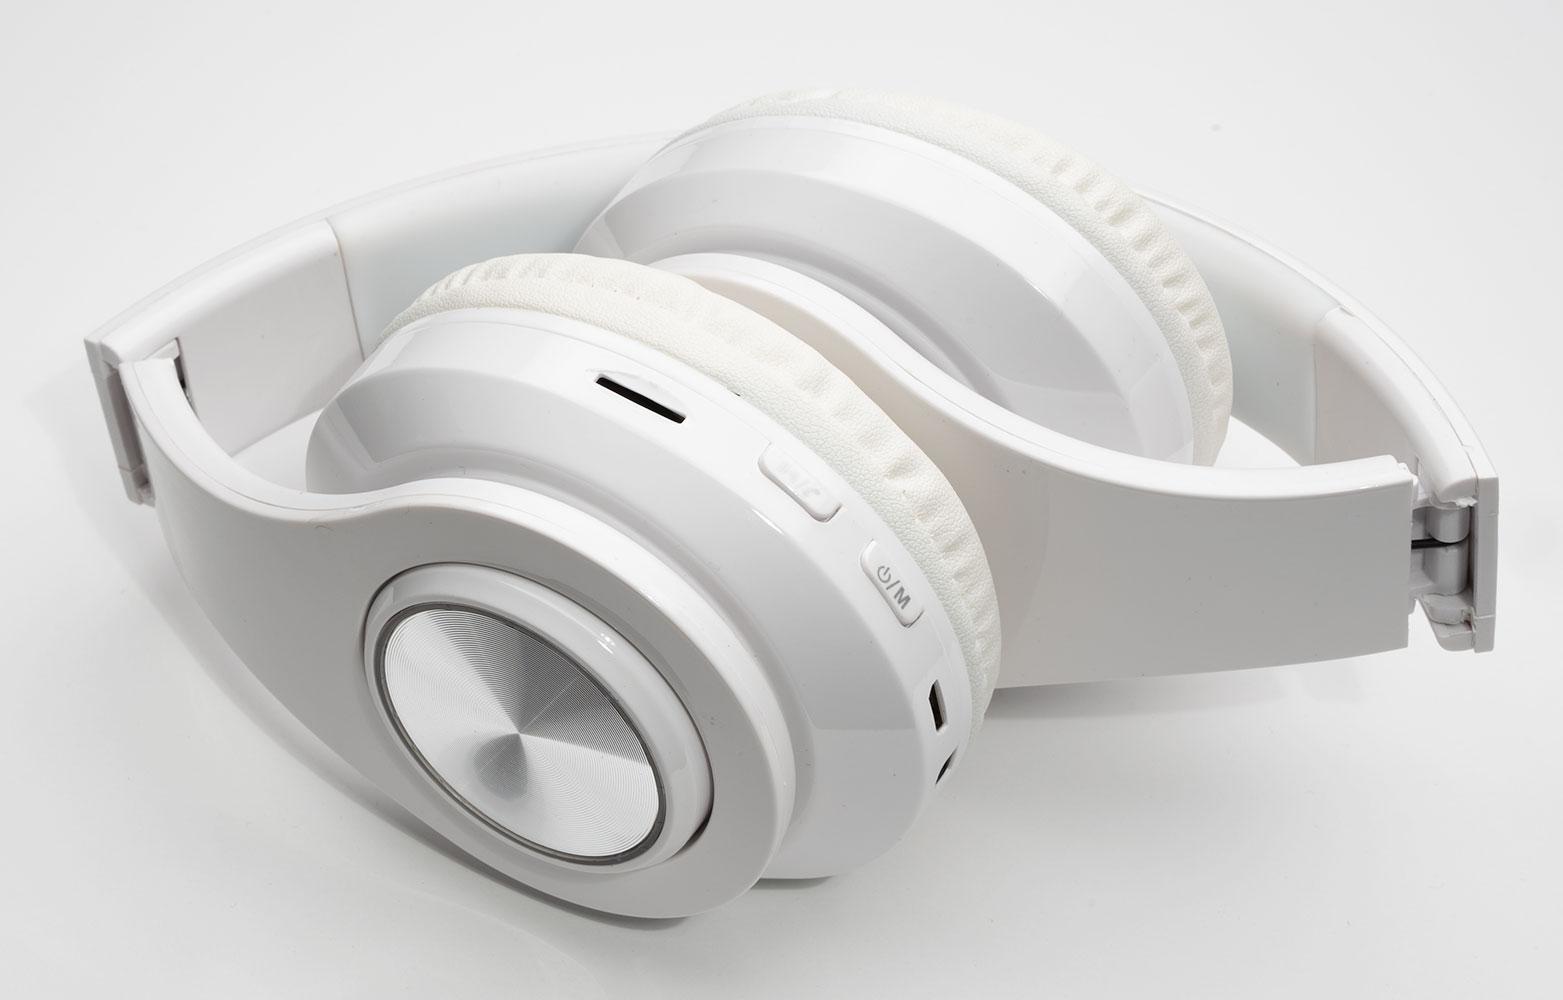 Sonim XP3 Plus Wireless Headphones Noise Canceling Over-Ear Hands Free Bluetooth White